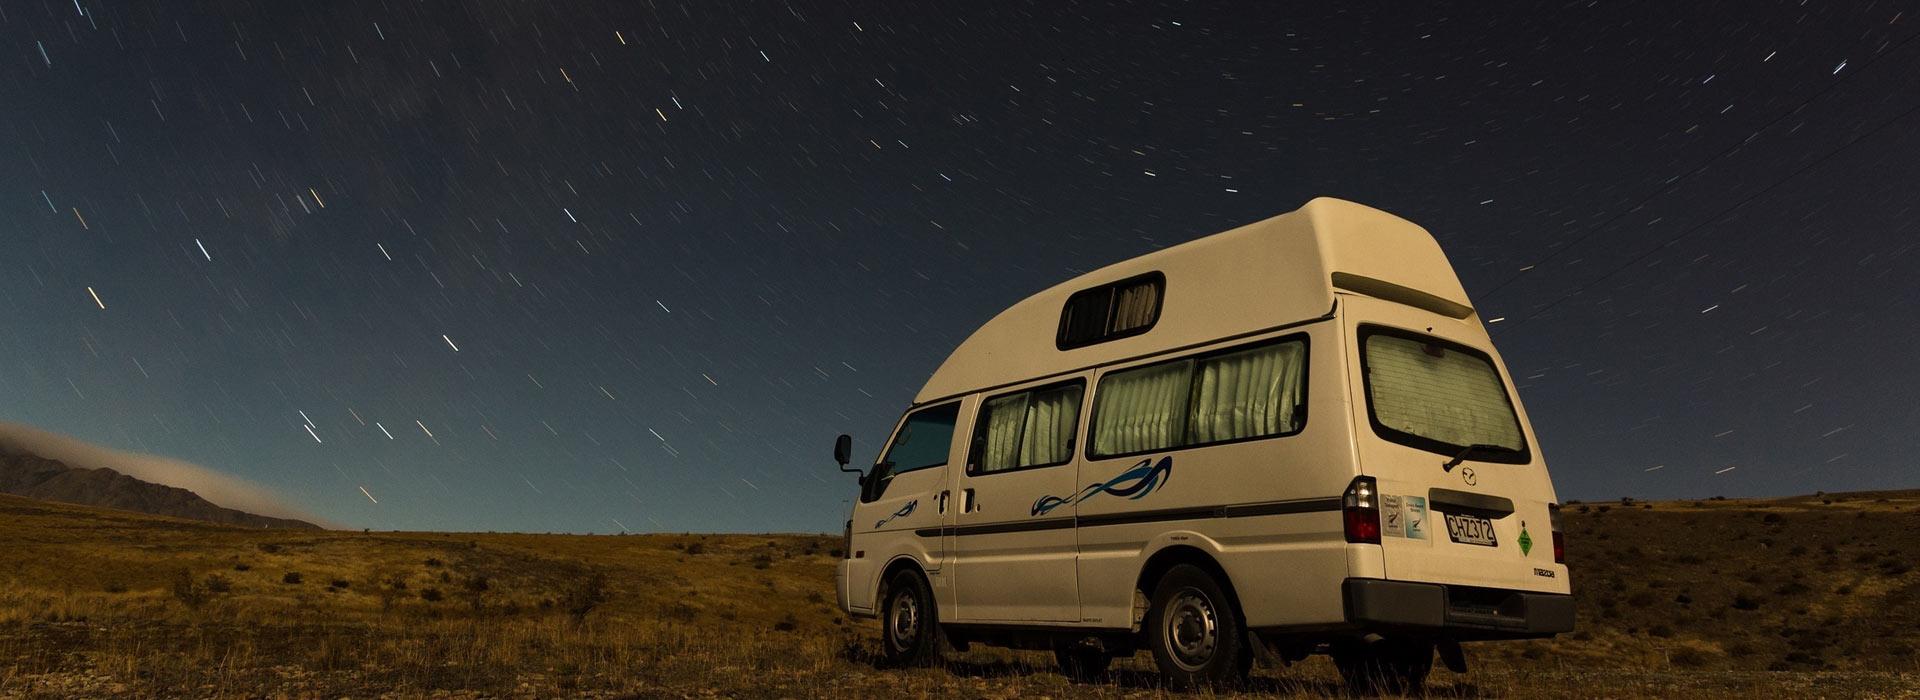 starry_night_at_lake_tekapo_in_new_zealand